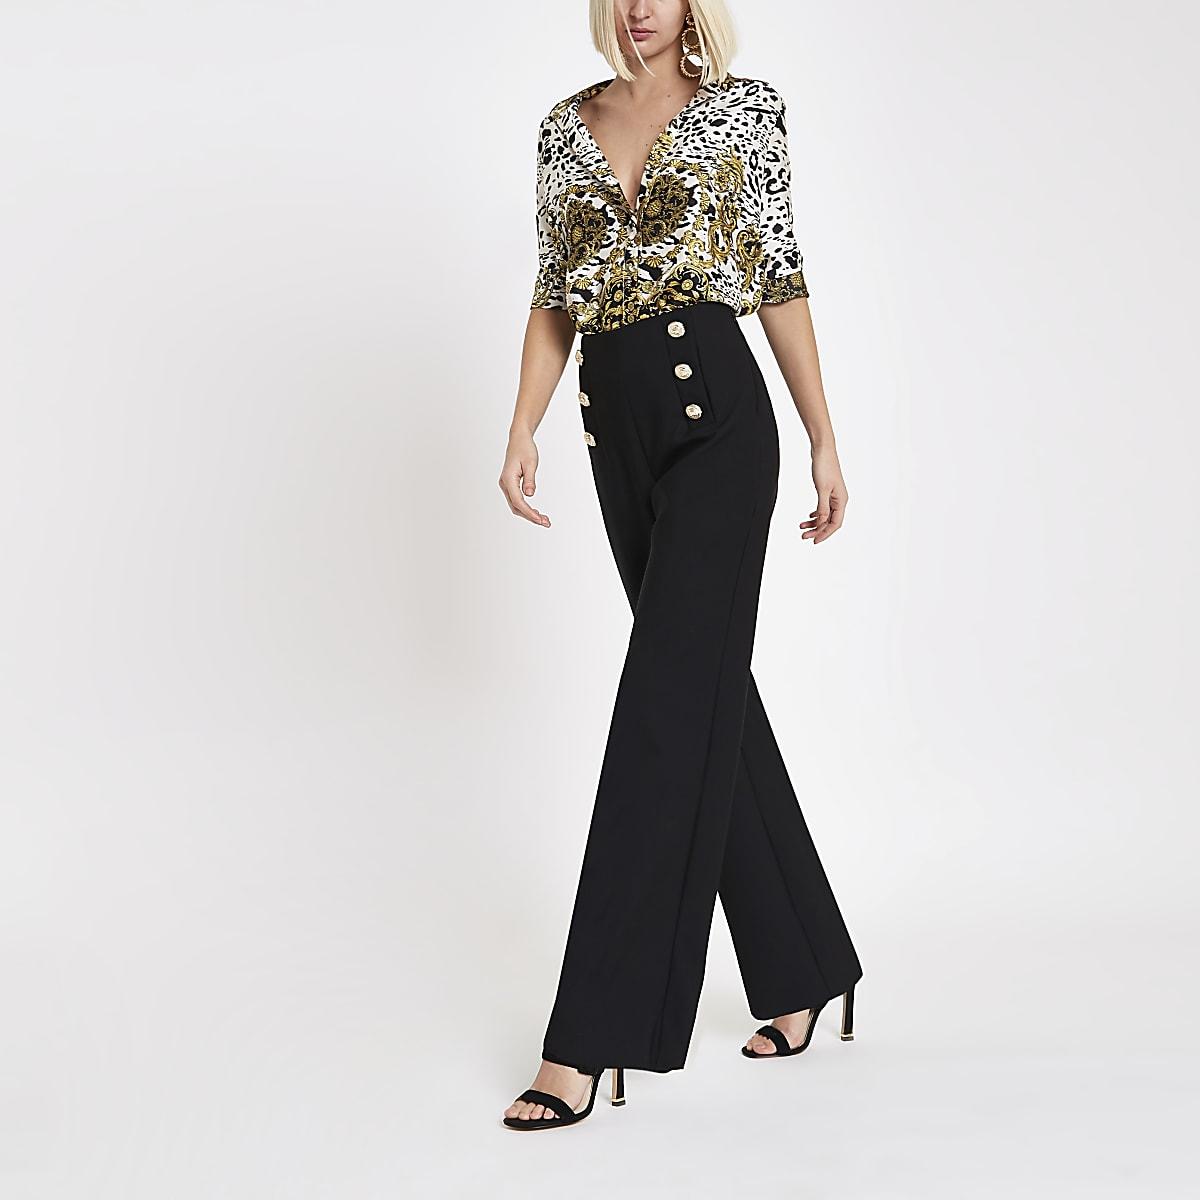 pas mal 3c6f8 68239 Black gold tone button wide leg trousers